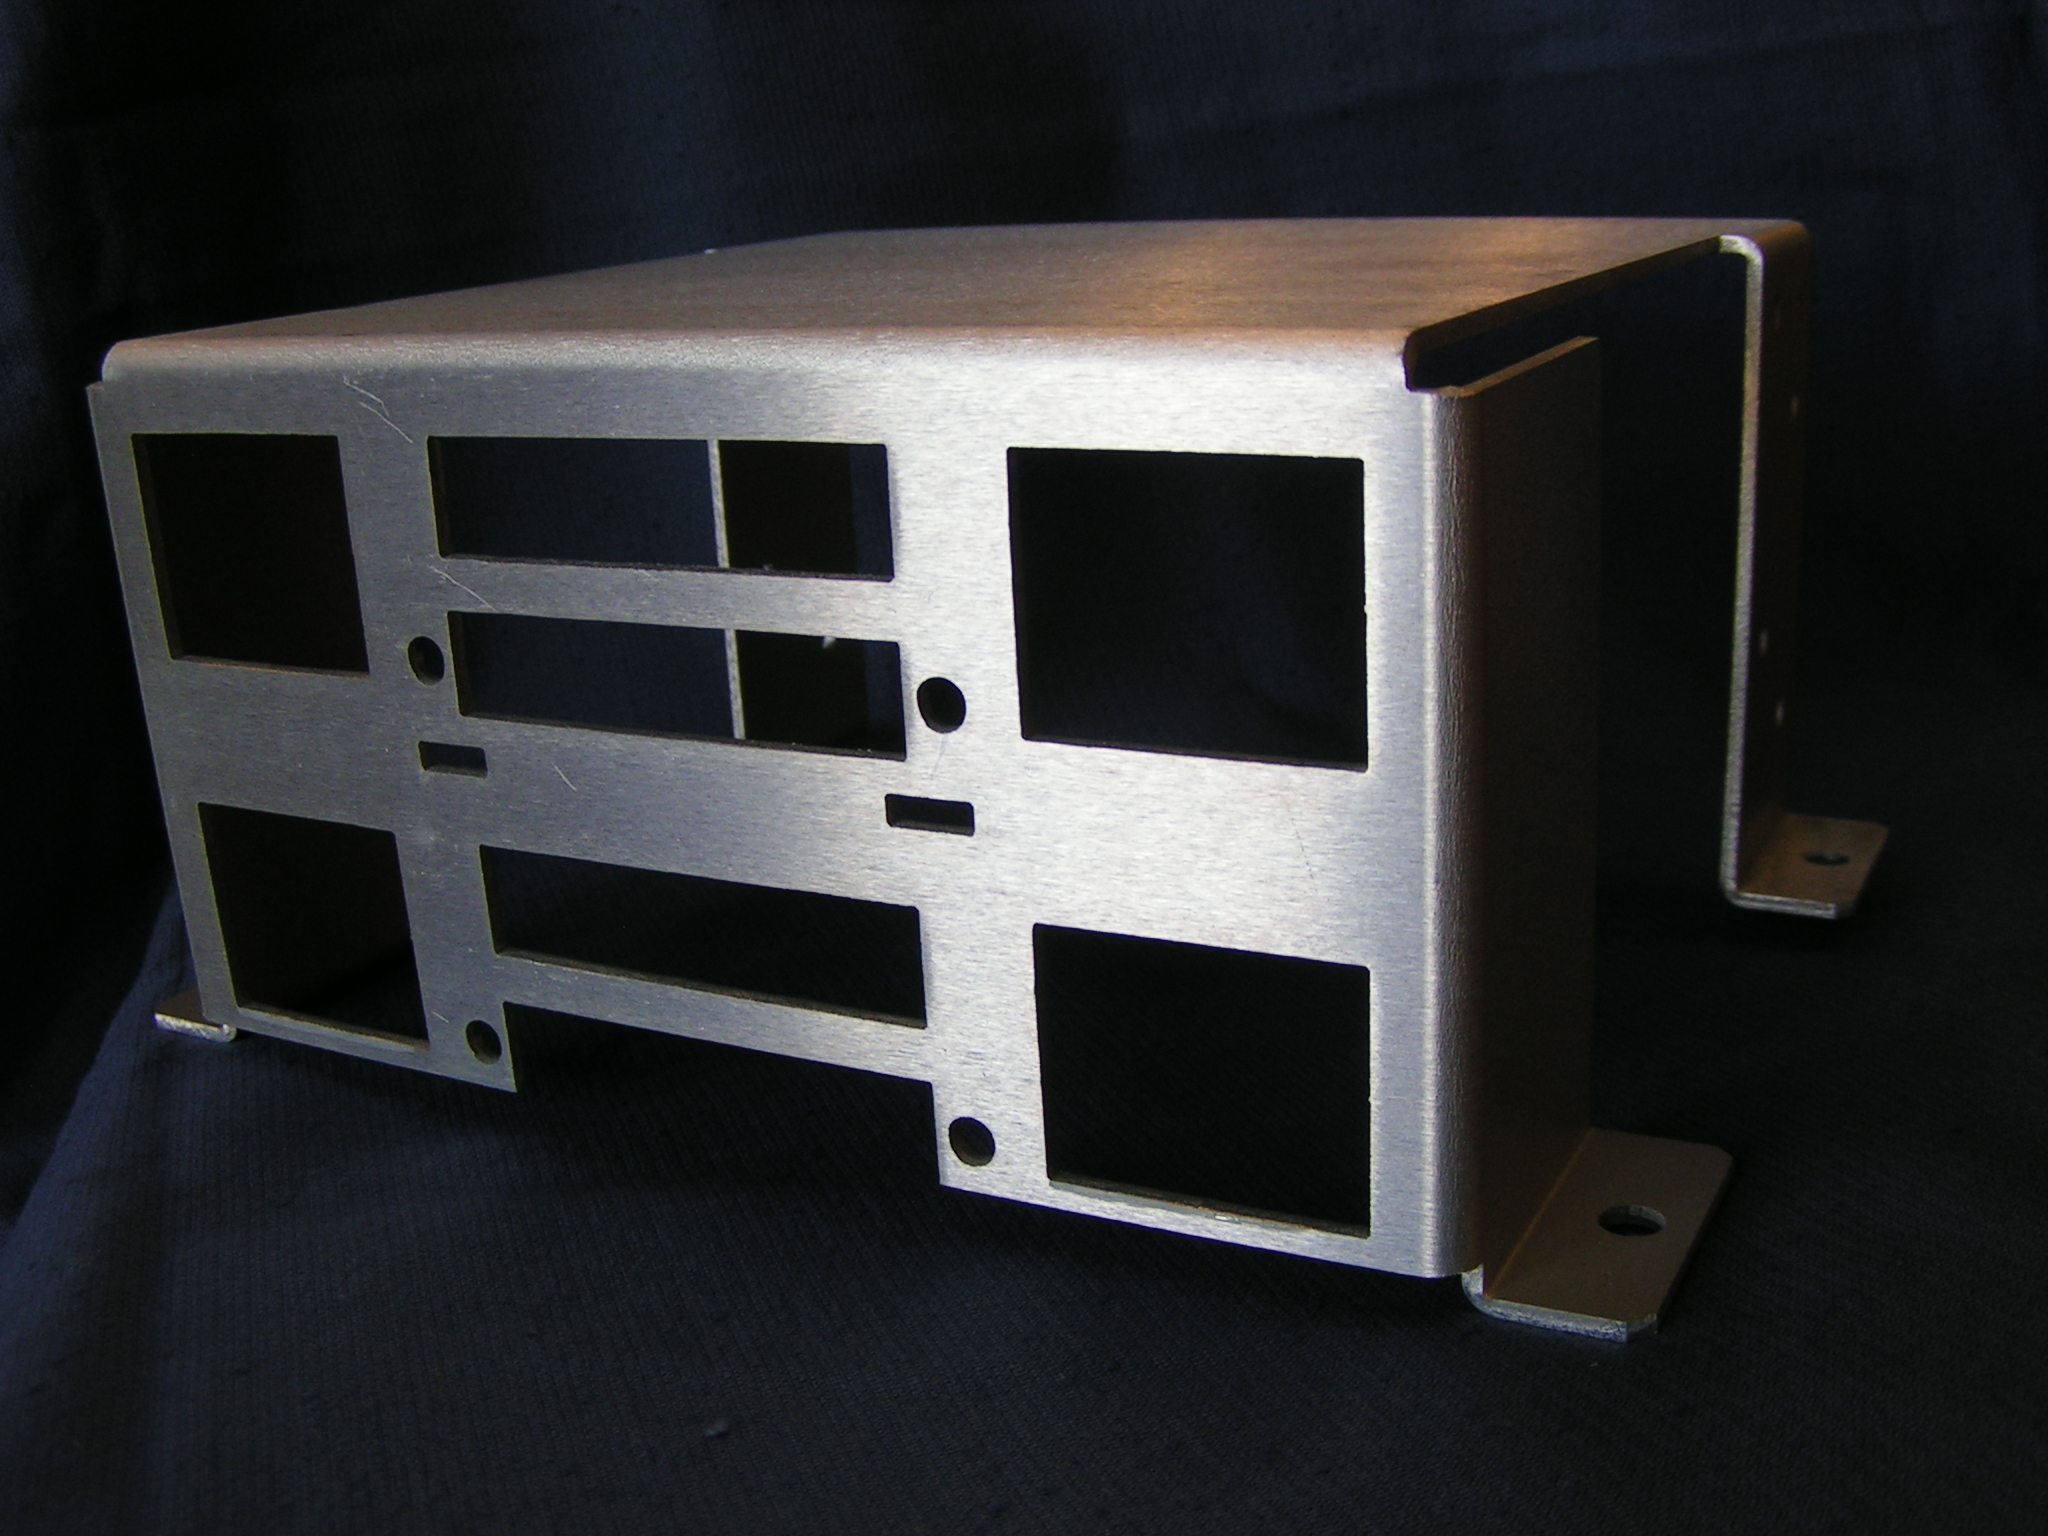 EMFSD.com | Electronic Metal Fab